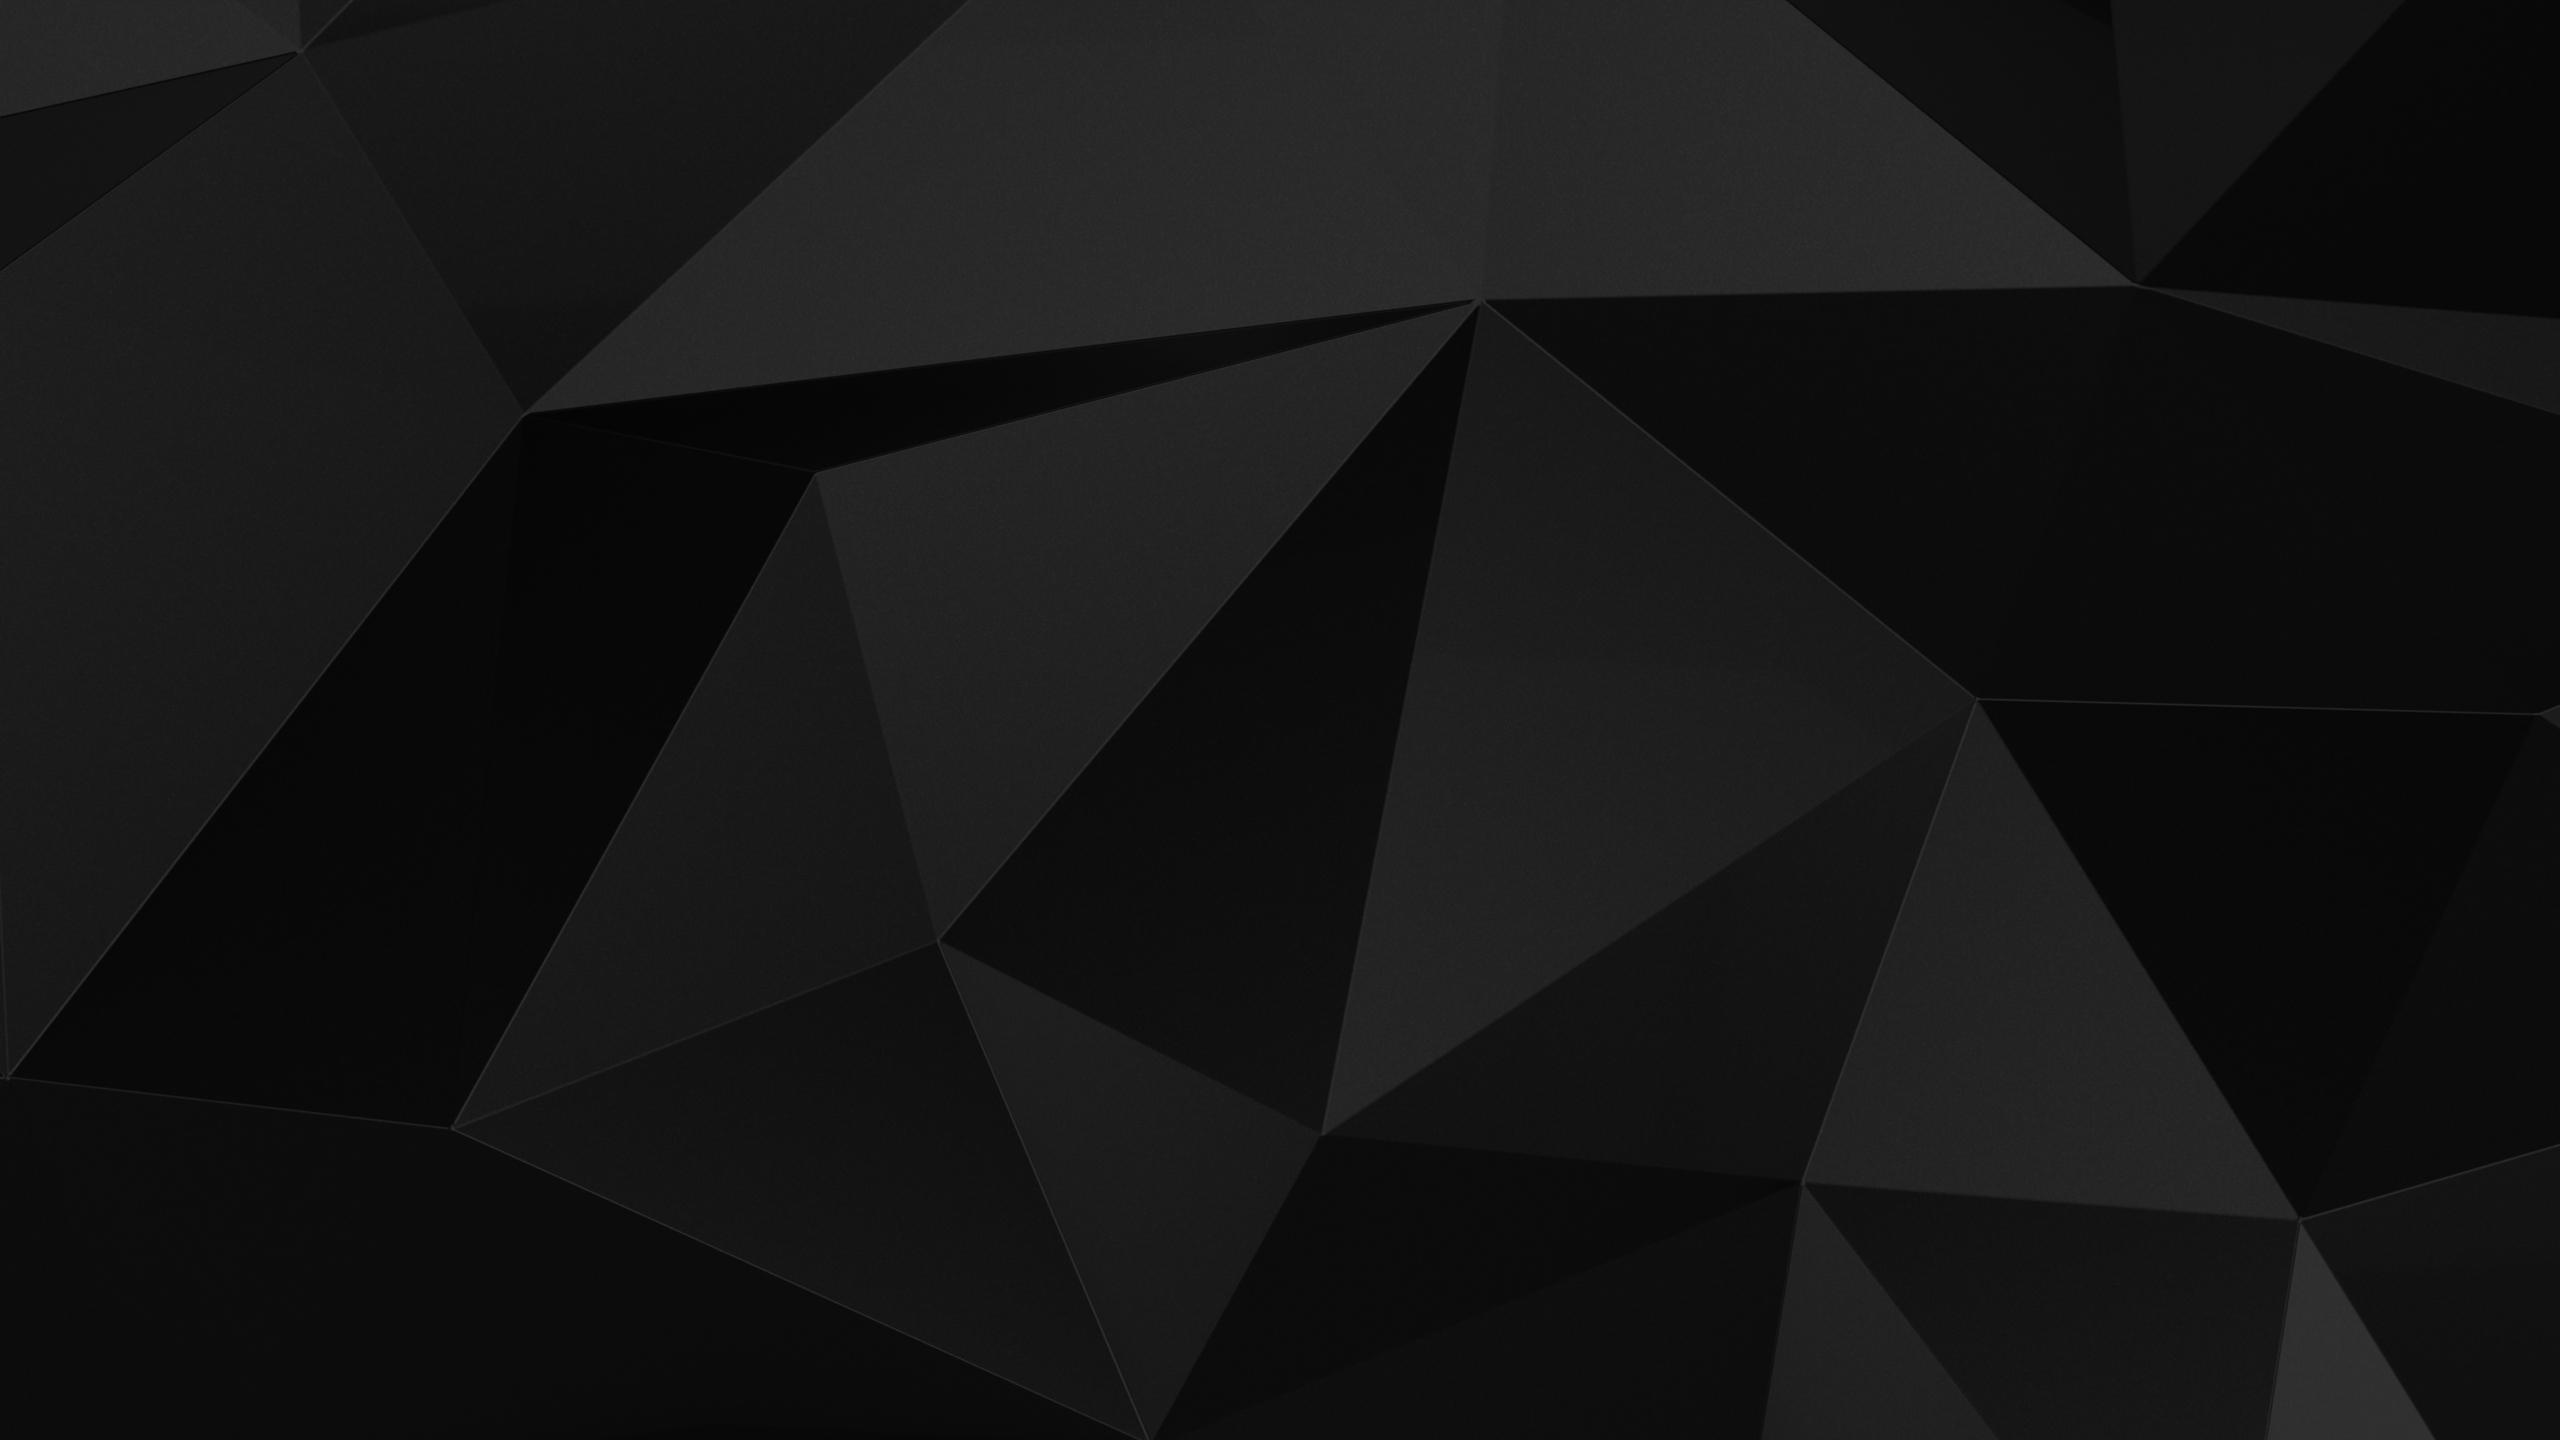 2560x1440 Dark Abstract Black Minimal 4k 1440P Resolution ...